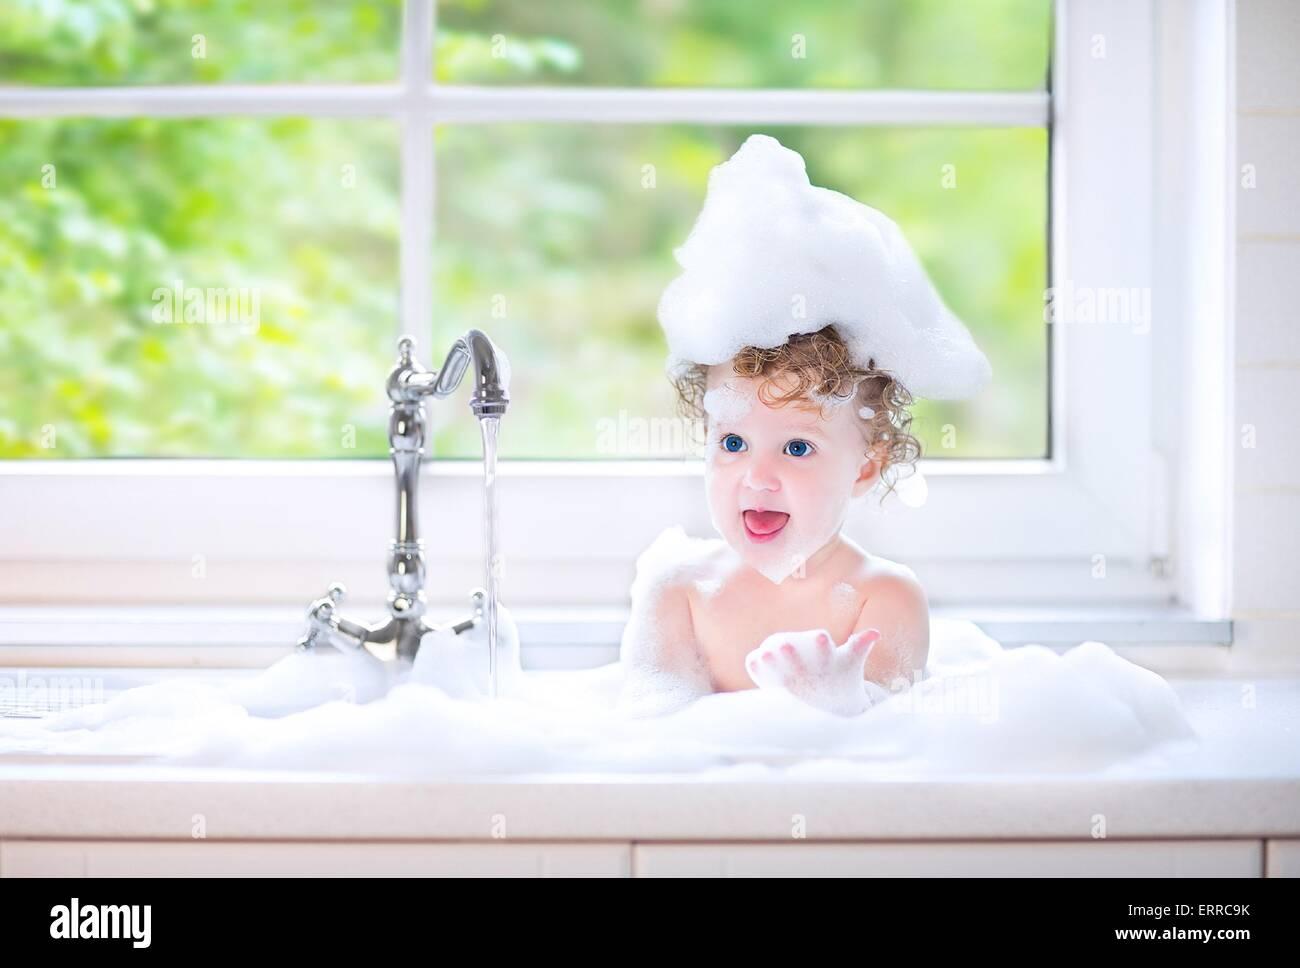 Girl Taking Bath In Tub Bathtub Stock Photos & Girl Taking Bath In ...